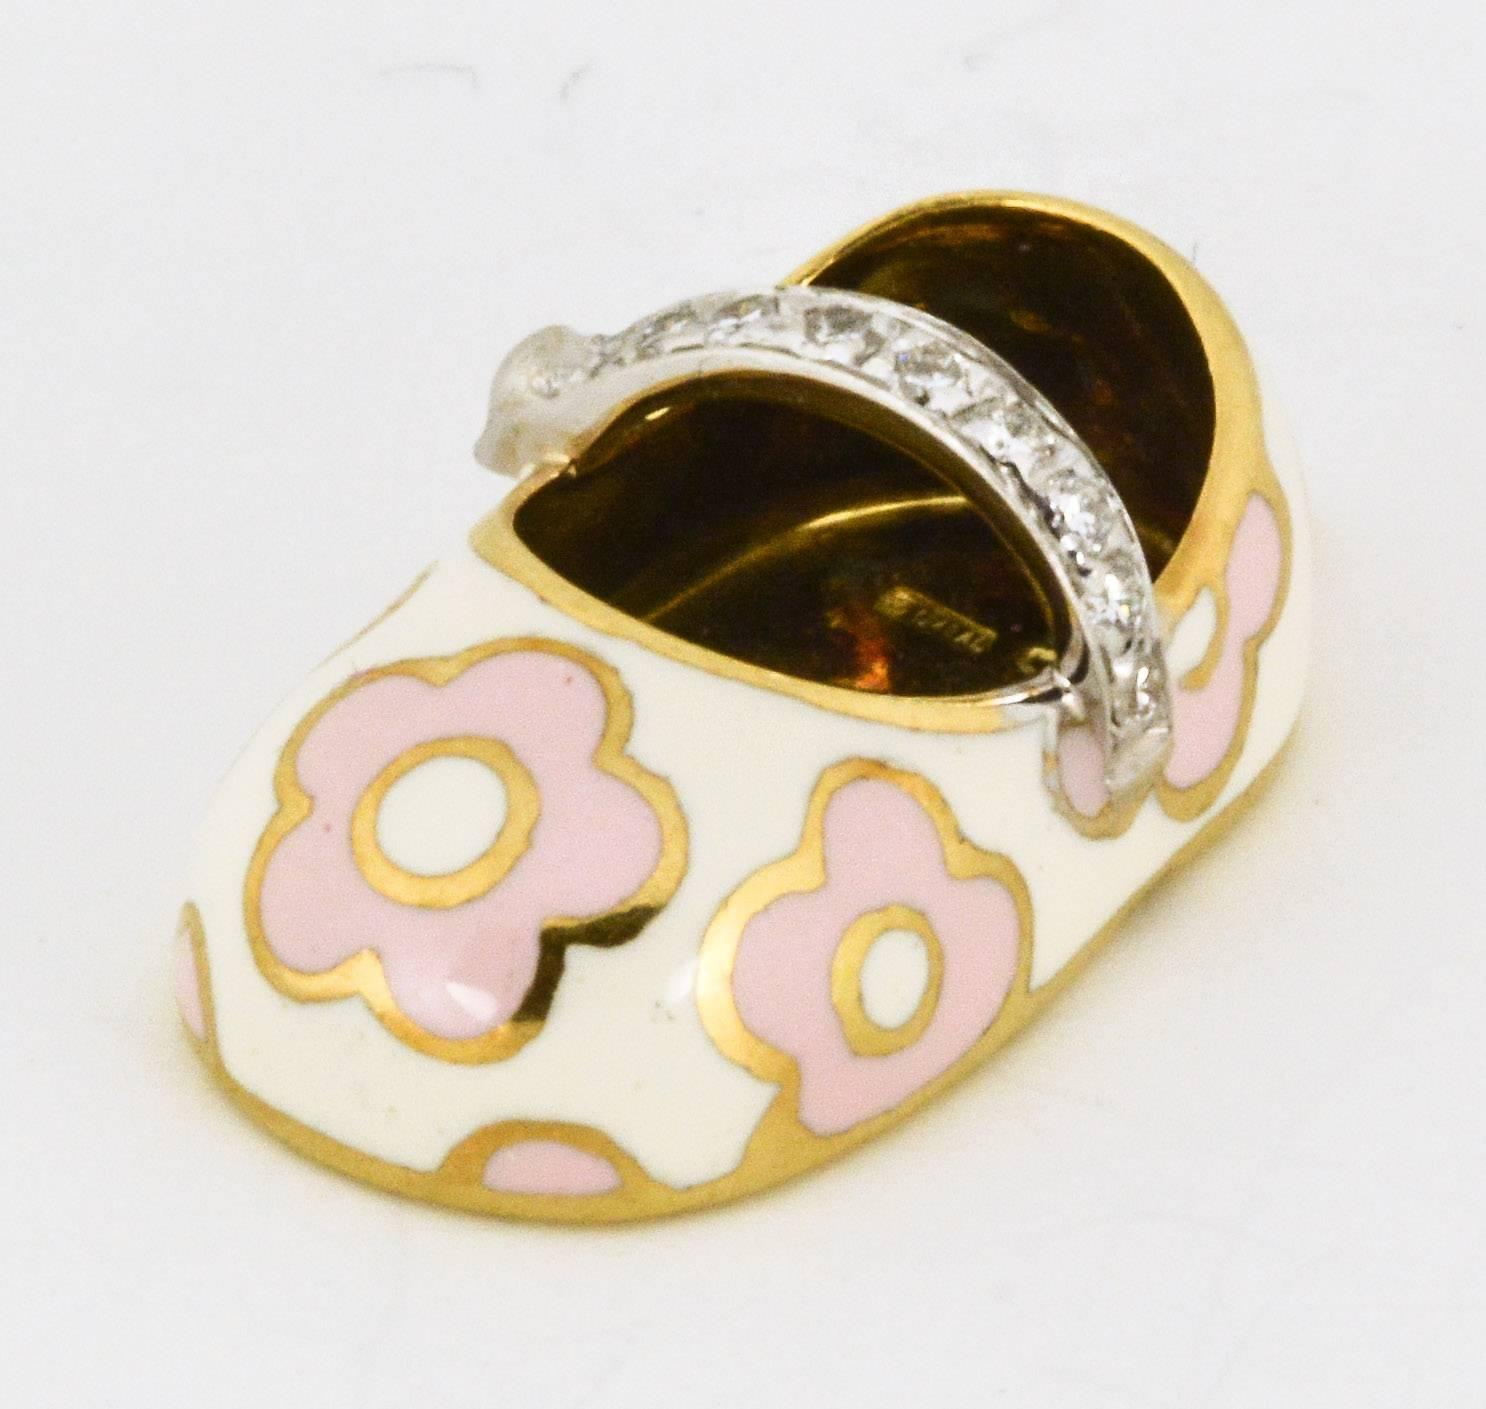 aaron basha enamel diamond gold baby shoe at 1stdibs